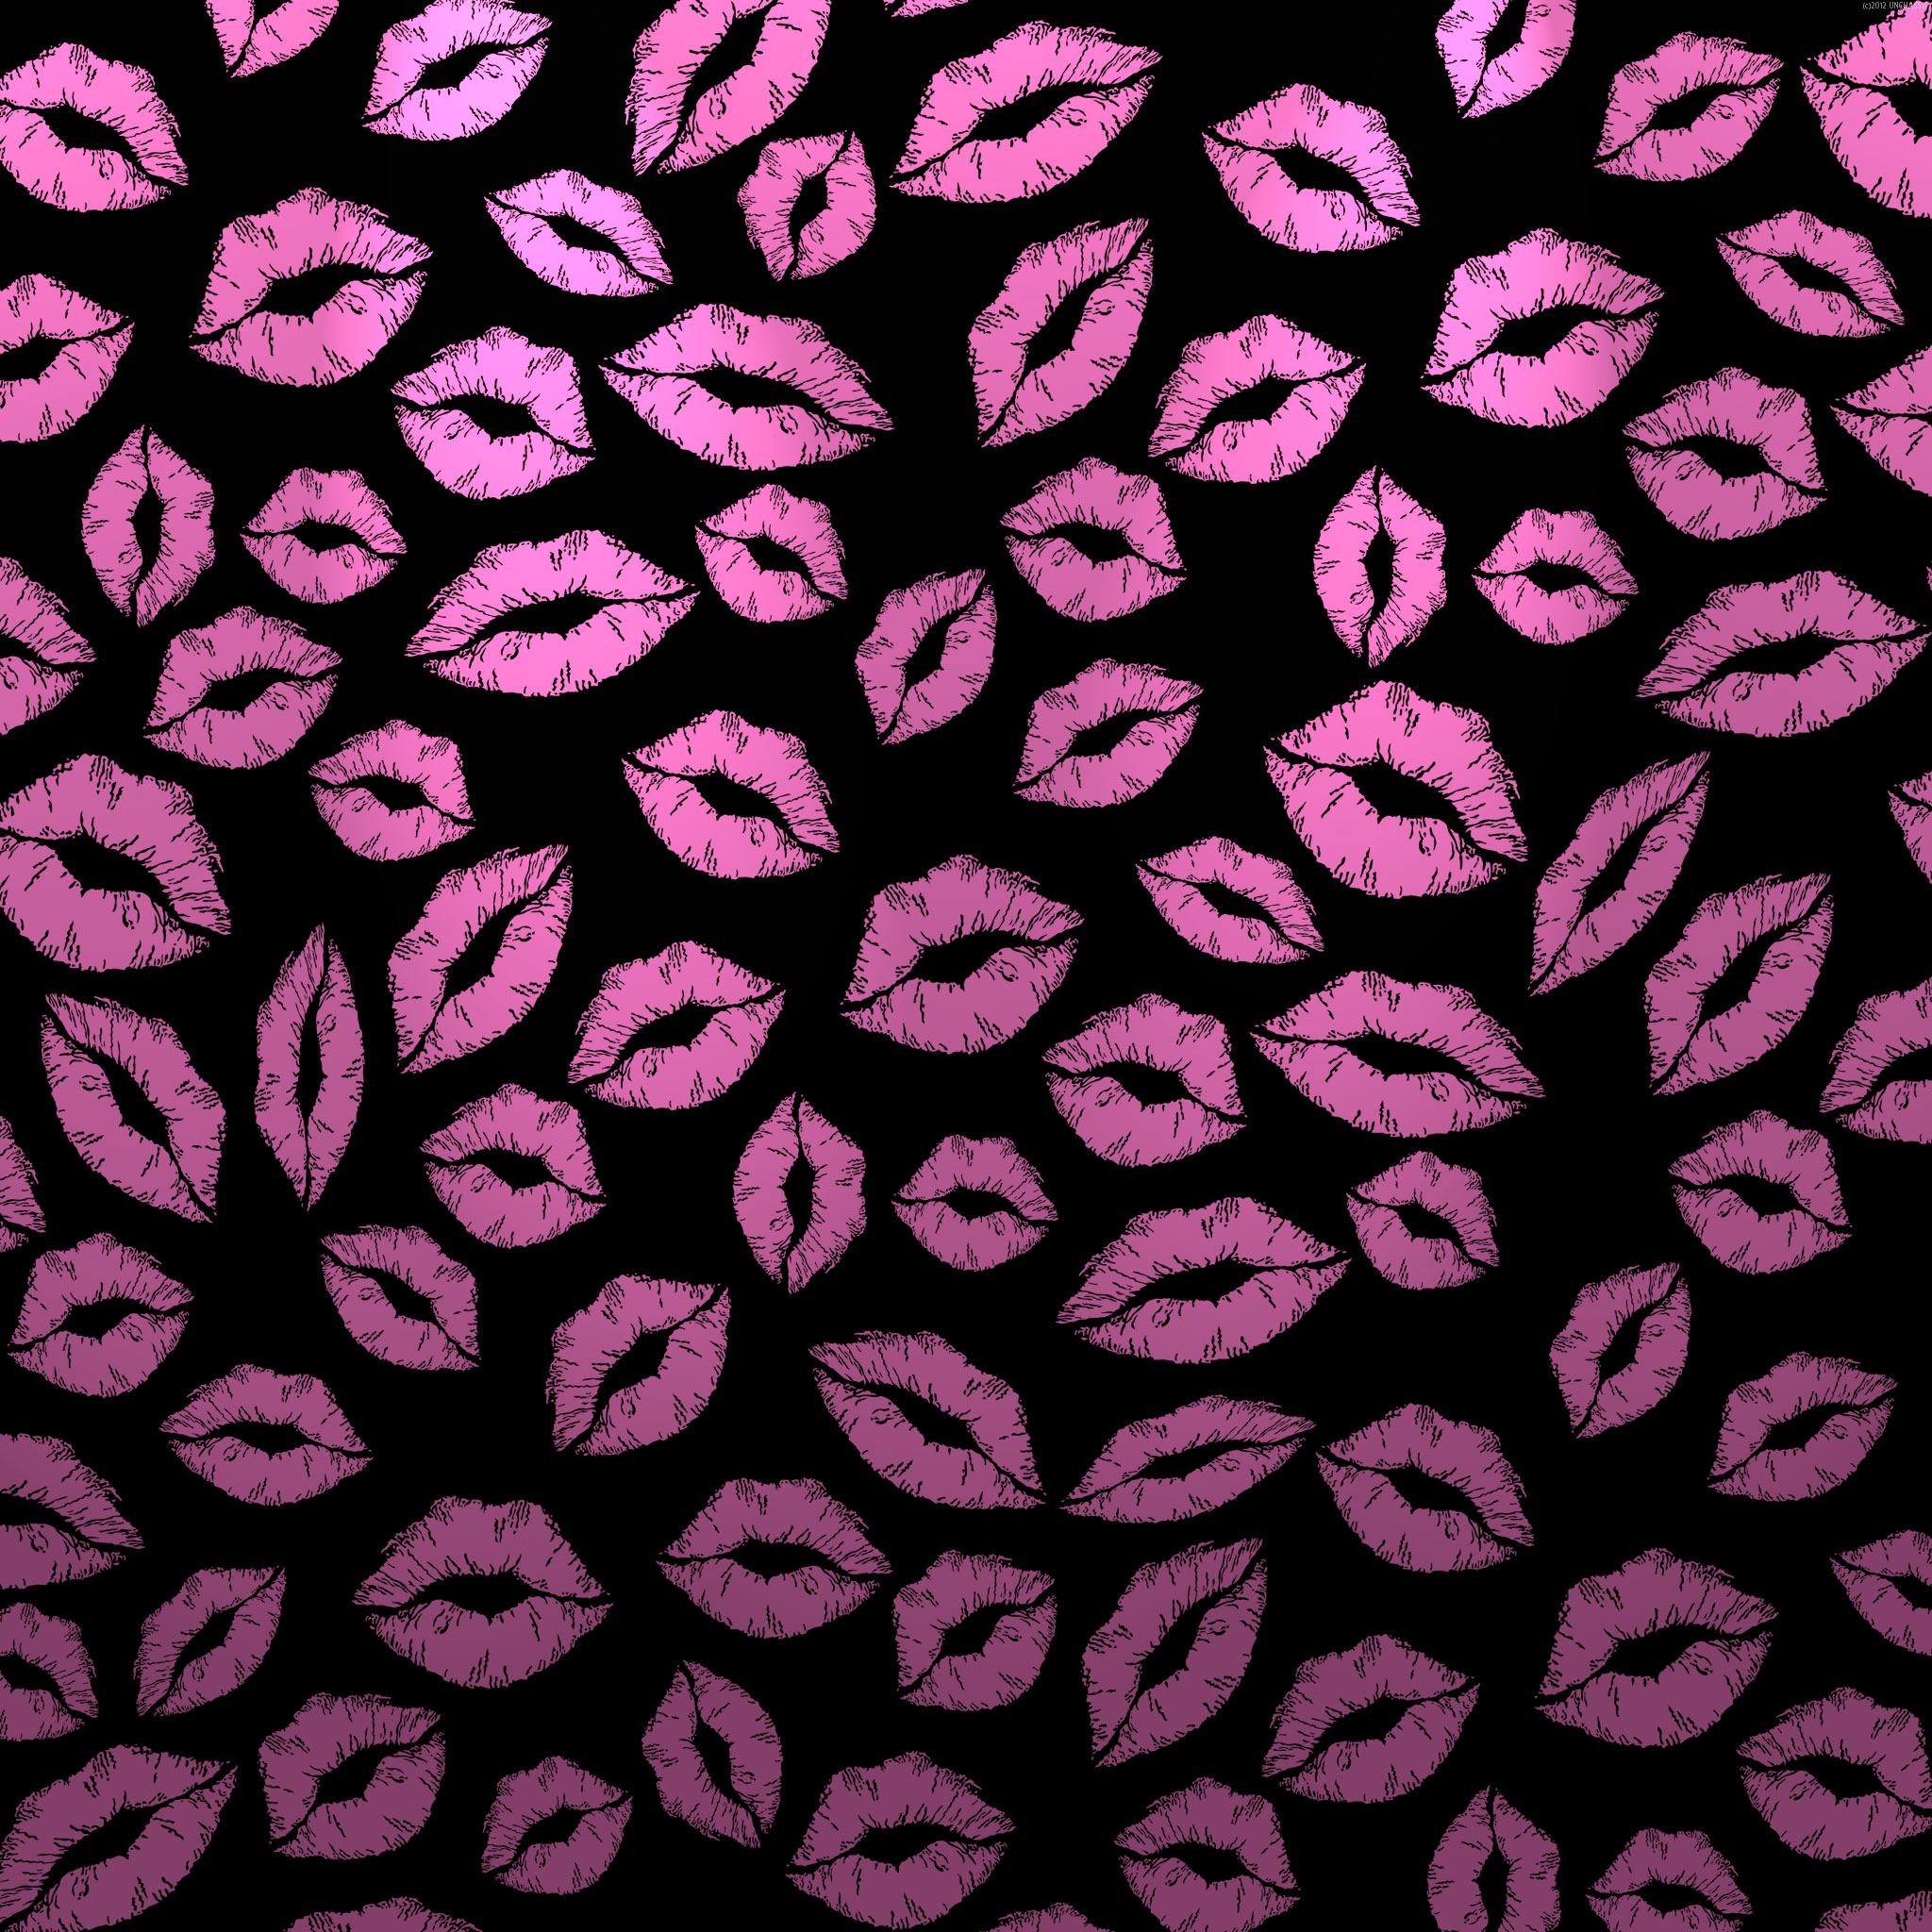 pink and black zebra print wallpaper hd pink and black zebra wallpaper 2048x2048